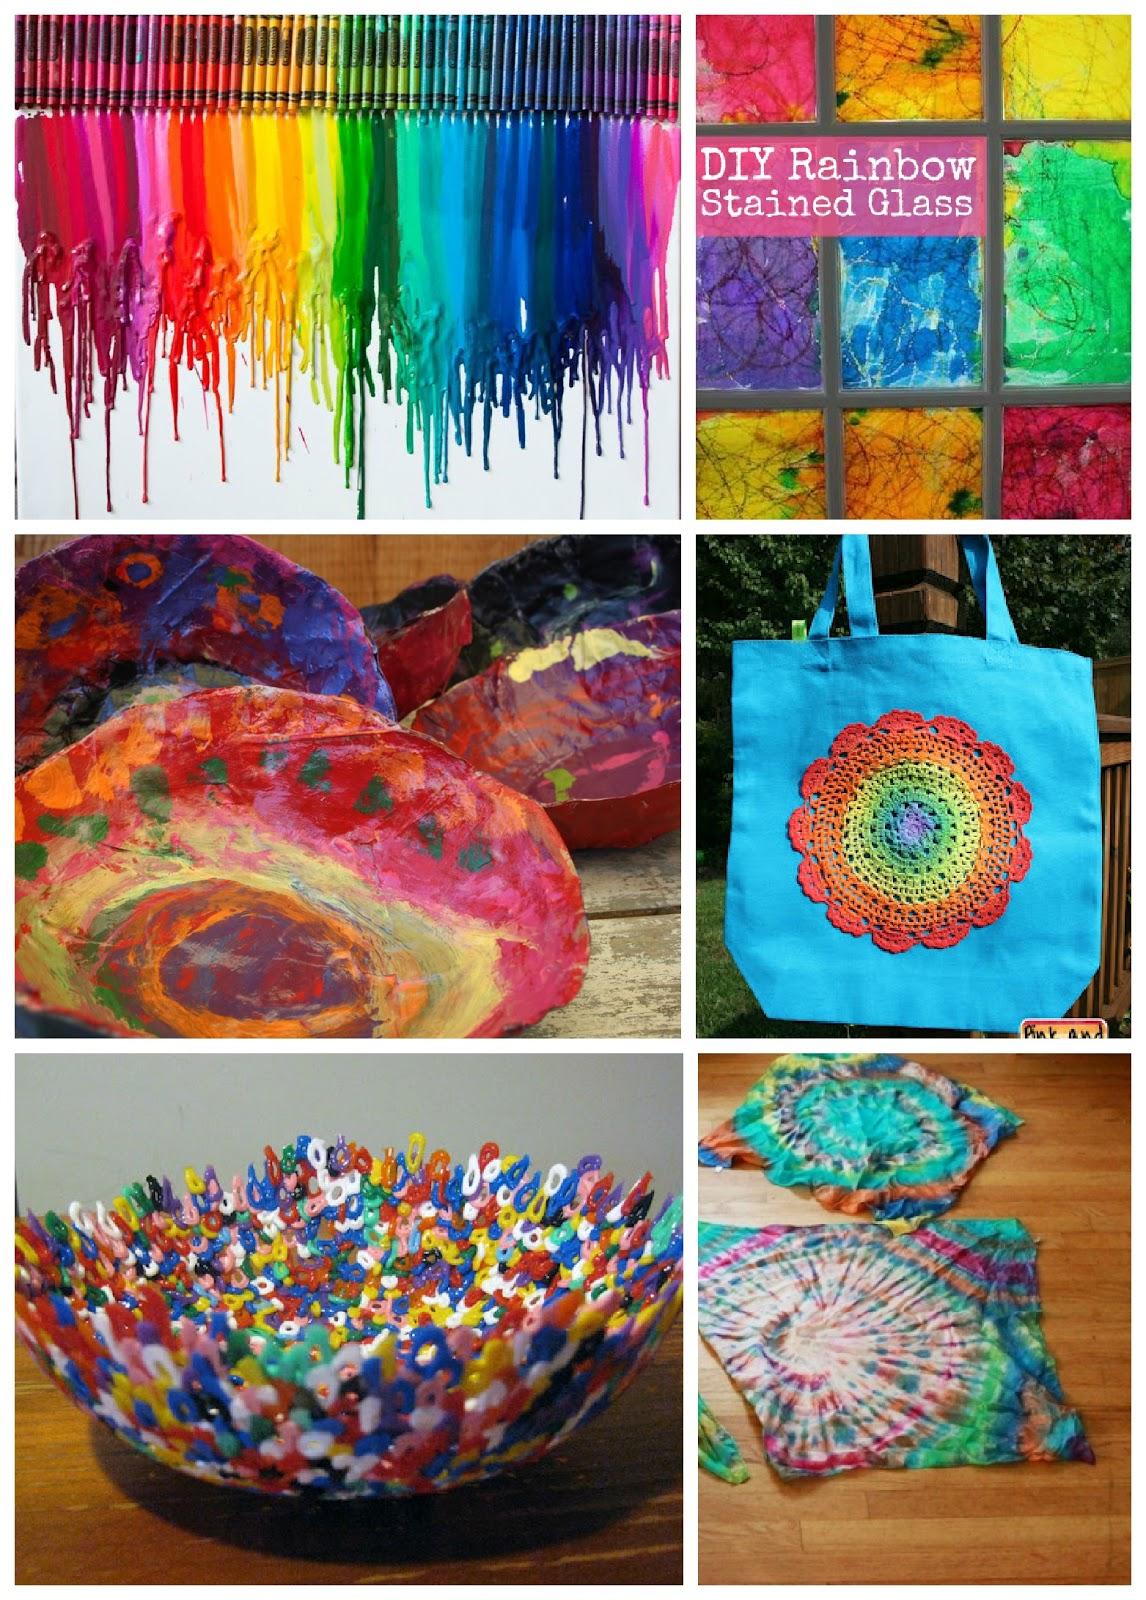 40 fantastic rainbow activities for kids the imagination tree. Black Bedroom Furniture Sets. Home Design Ideas